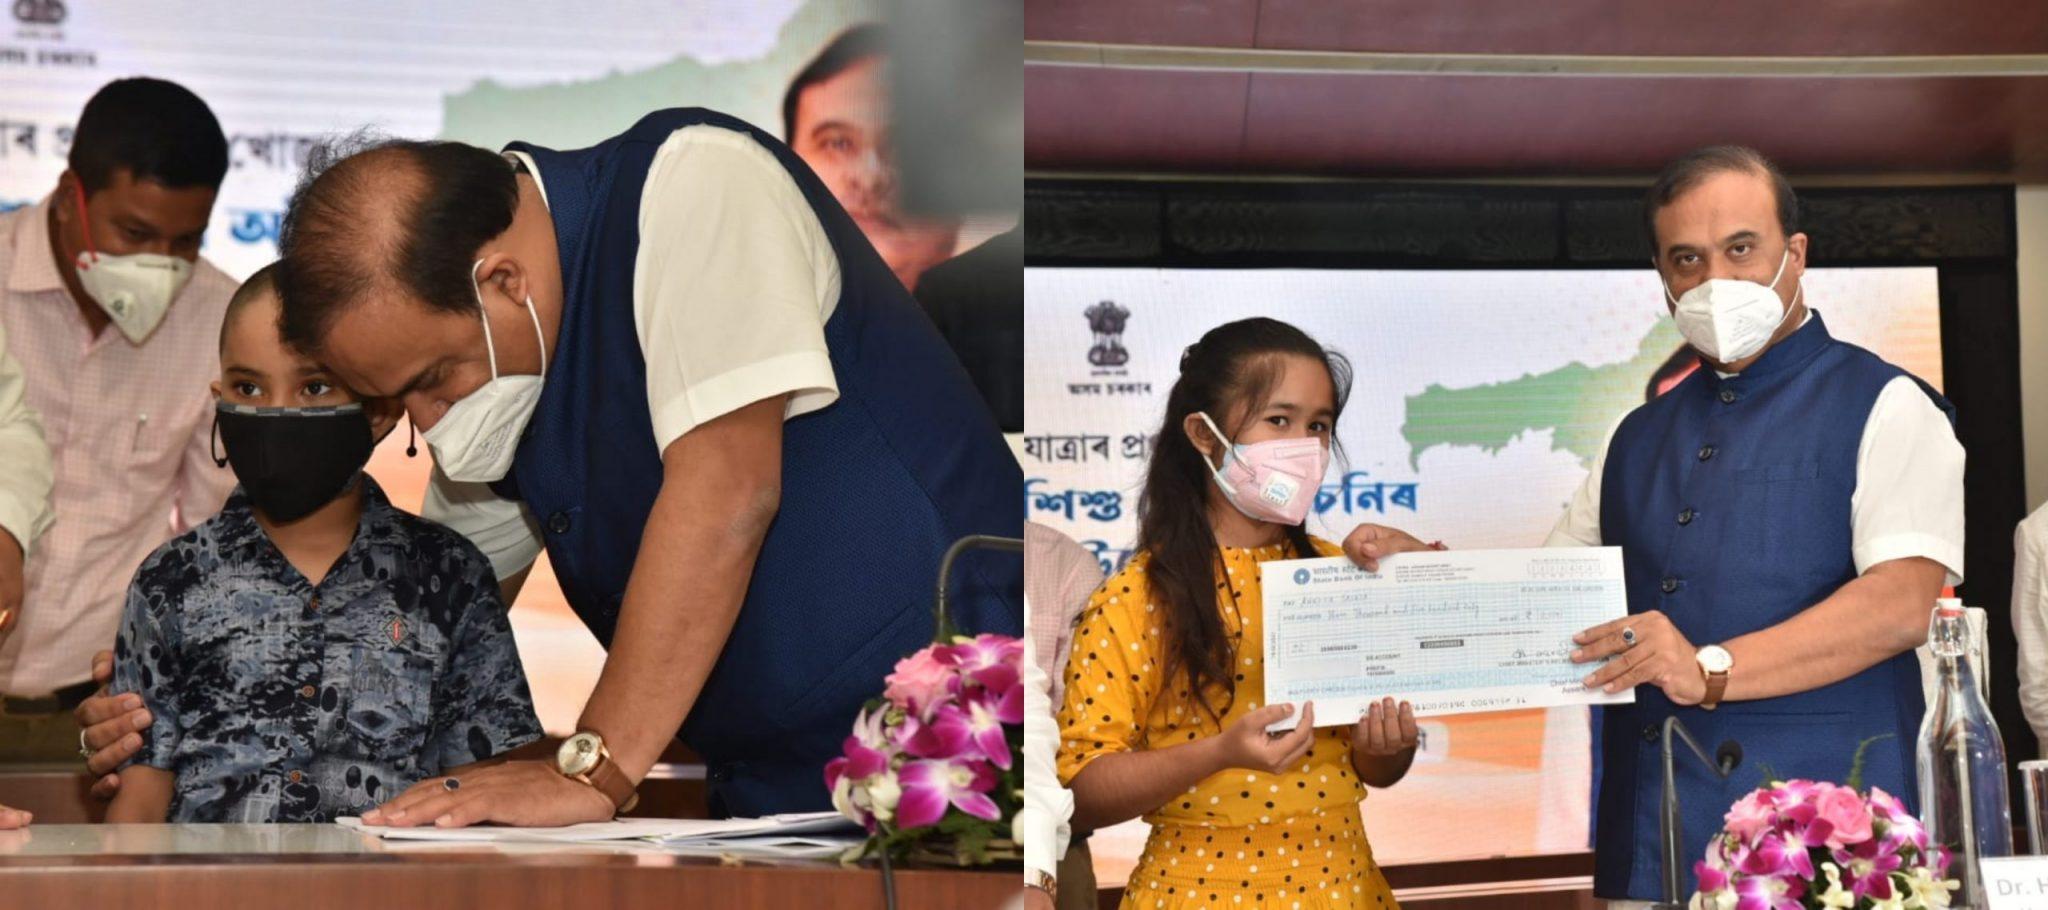 Assam CM Sarma launches Sishu Seva Achoni for COVID-19 Orphans | அசாம் முதல்வர் சர்மா சிஷு செவா அச்சோனியை COVID-19 னால் ஆன அனாதைகளுக்காக அறிமுகப்படுத்தினார் |_40.1